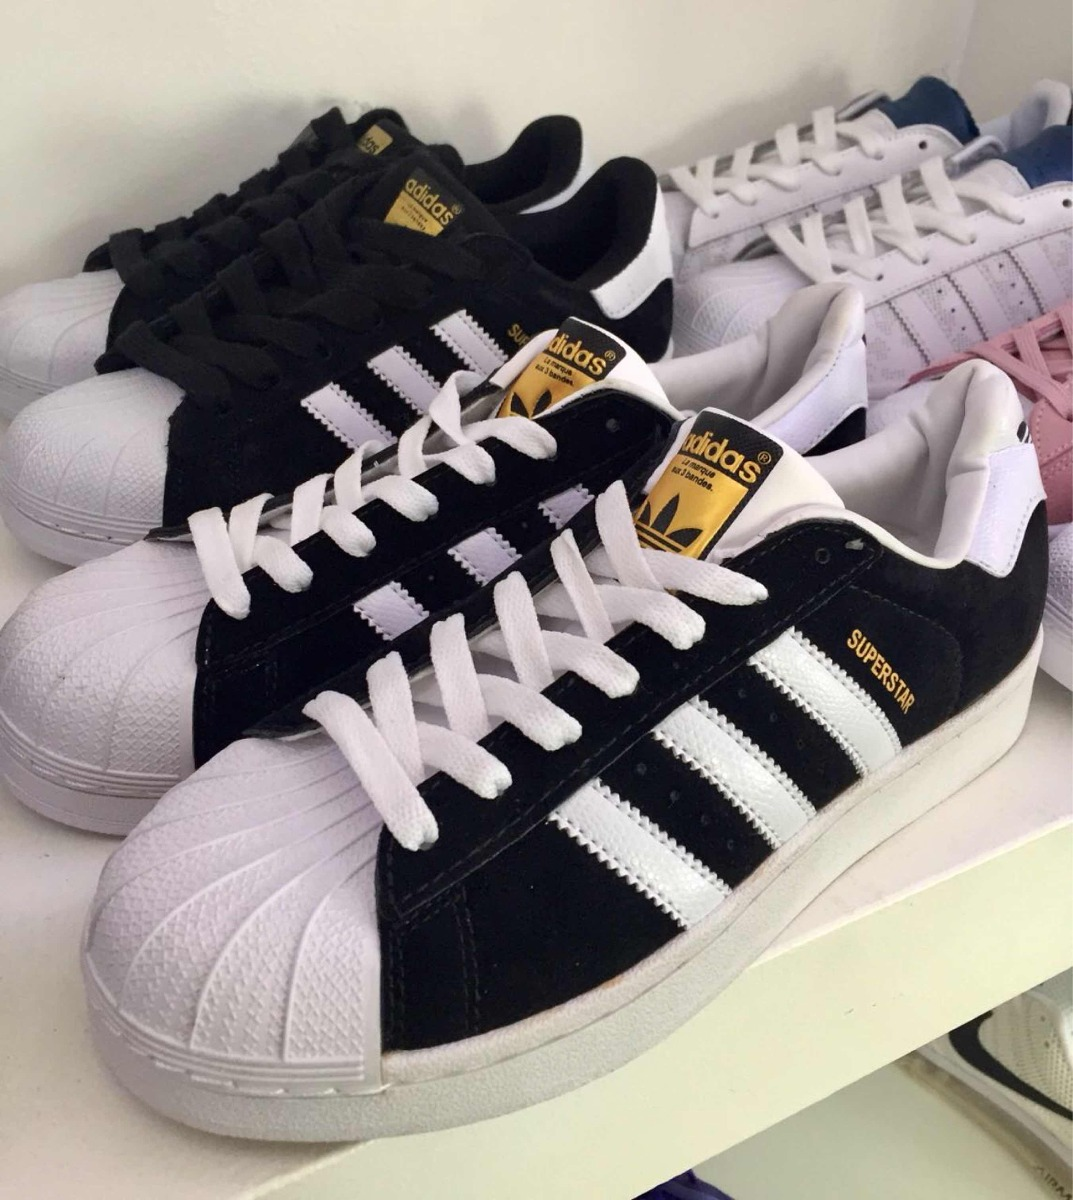 ce933af74abf3 ... sweden zapatillas adidas superstar negras gamuzada 40 41 42 43. cargando  zoom. b7922 9fbbb